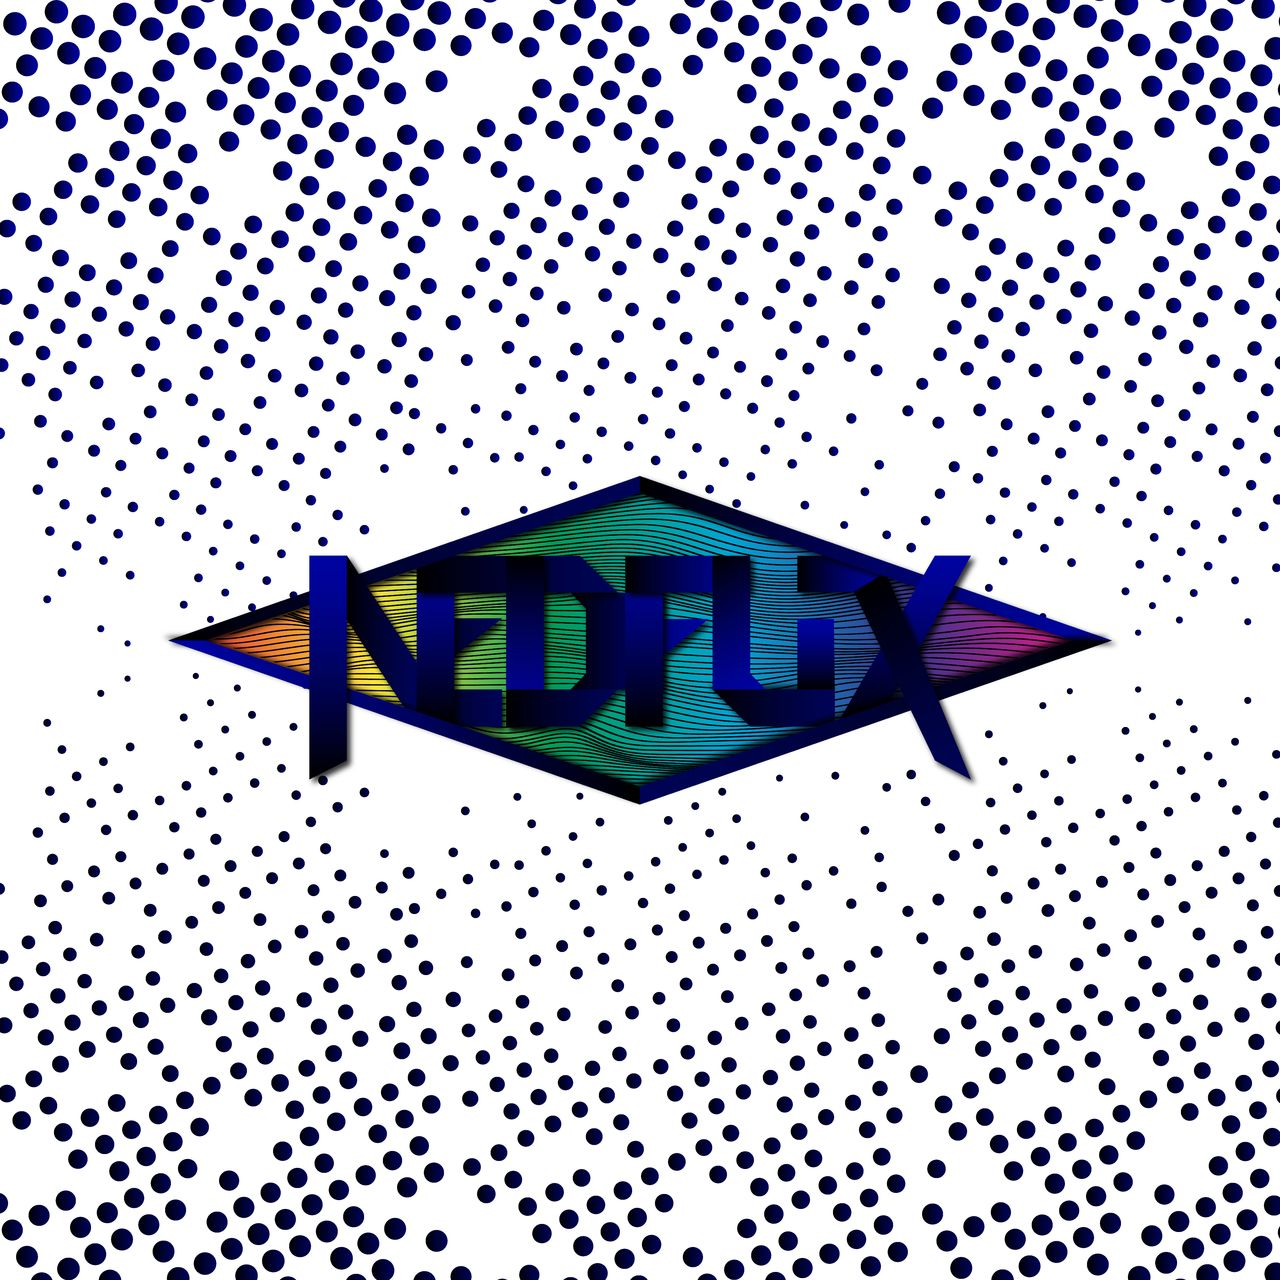 Nedflix